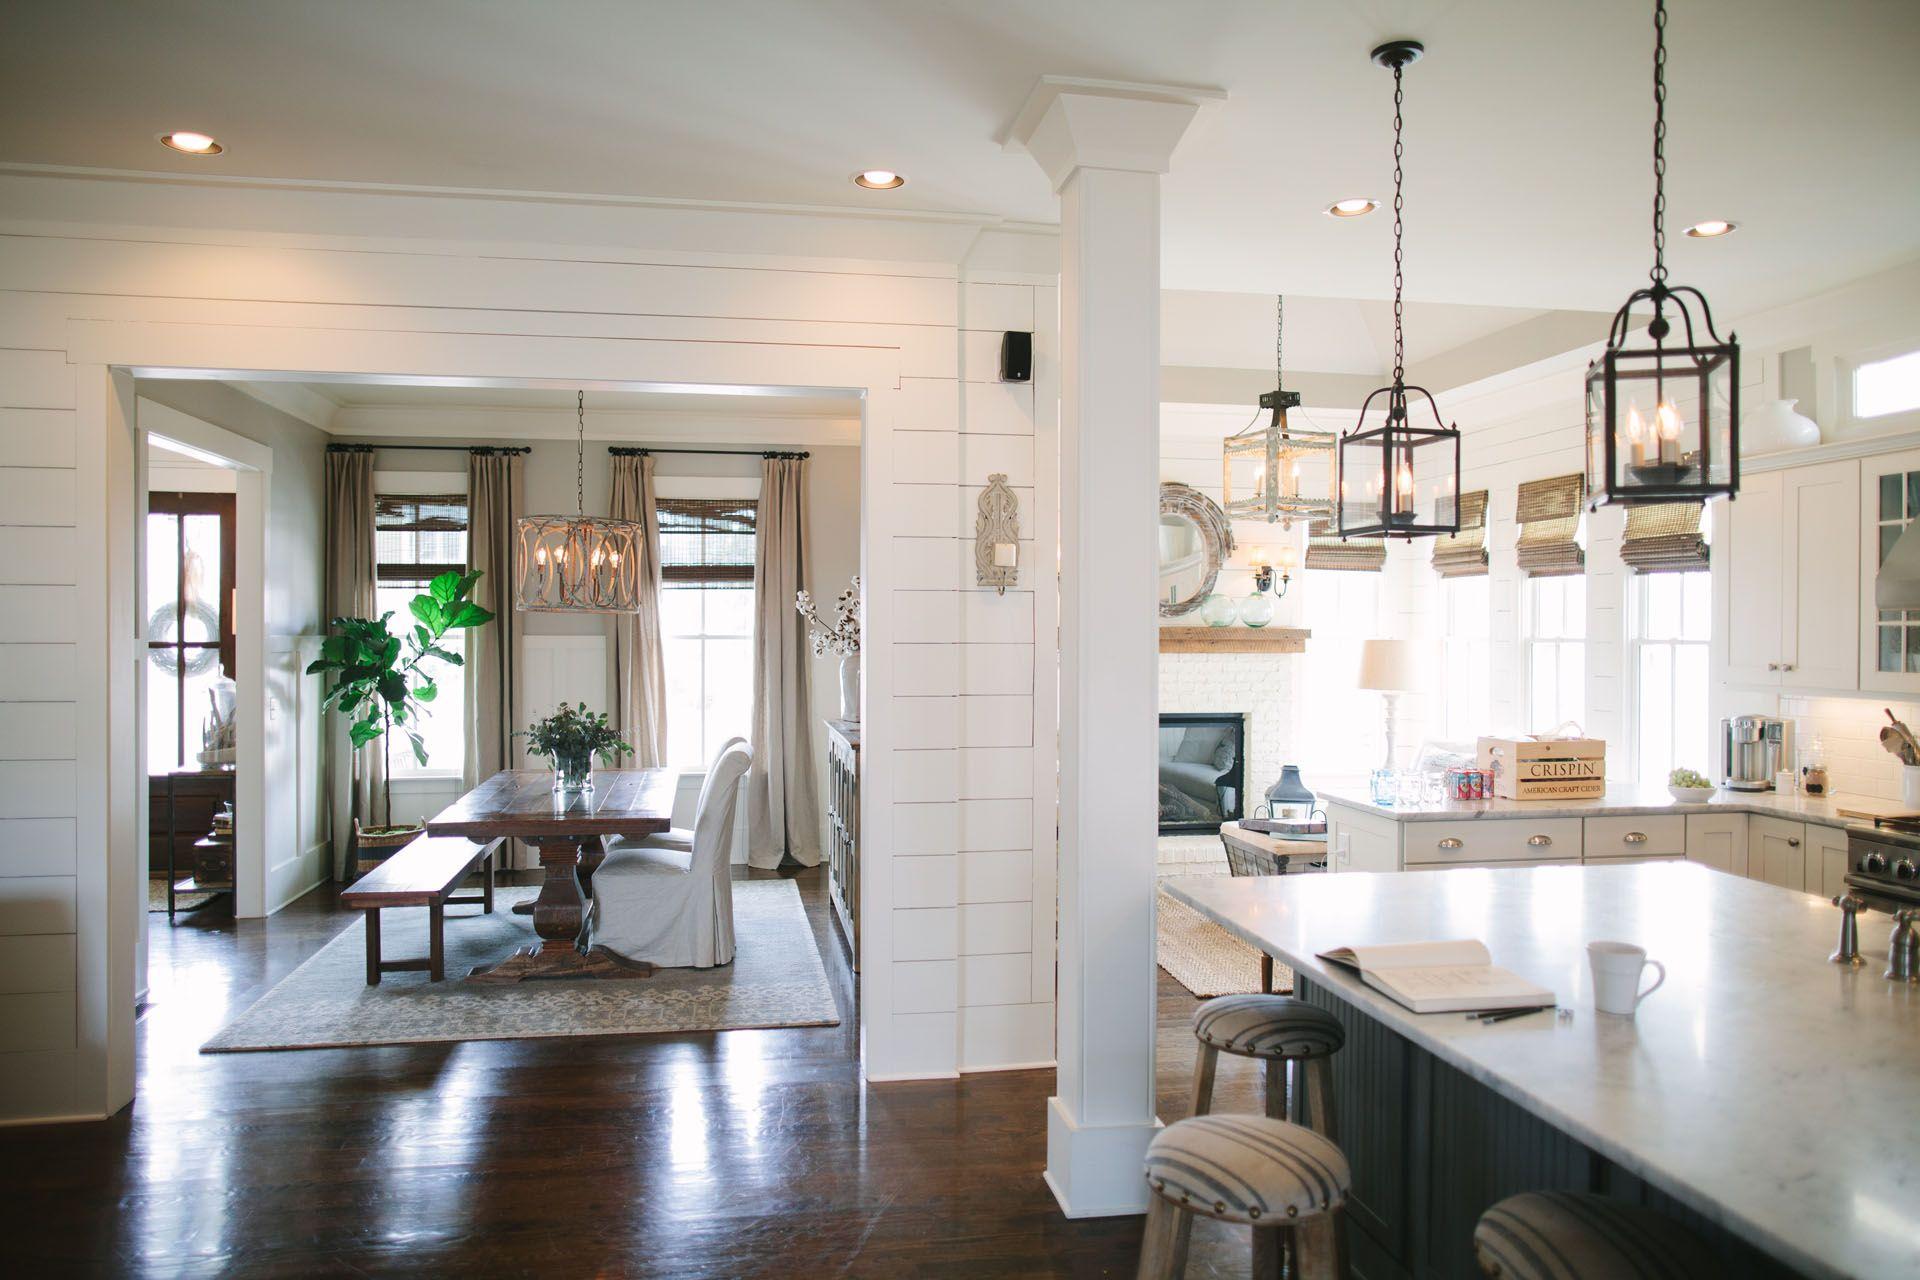 Merveilleux Rustic Trades Furniture | Rustic Distressed Reclaimed Dining Kitchen Farm  Tables Atlanta Denver Colorado | Custom